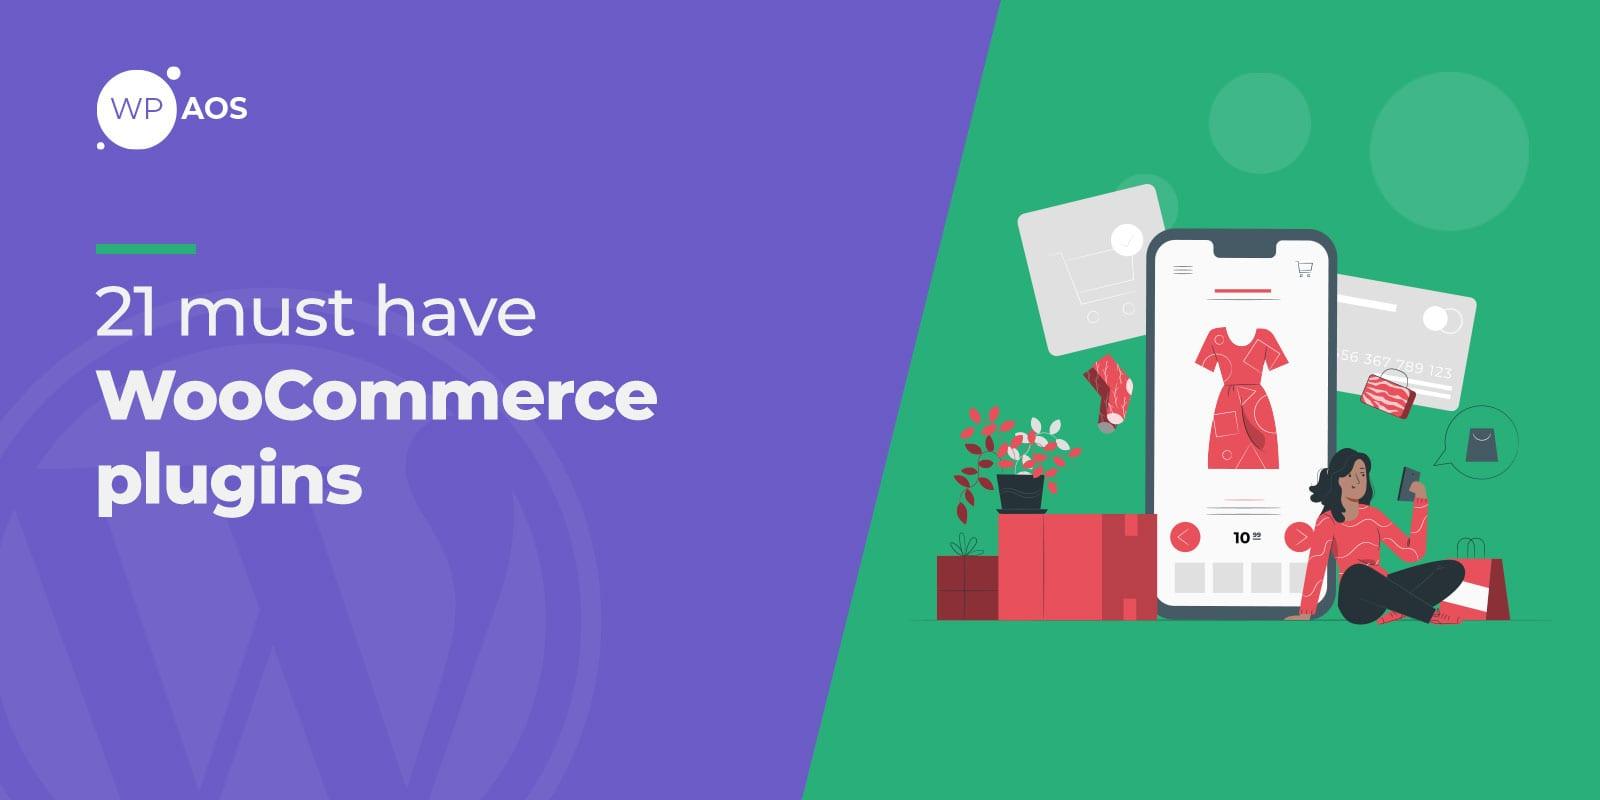 woocommerce plugins, online shop, wordpress, wpaos